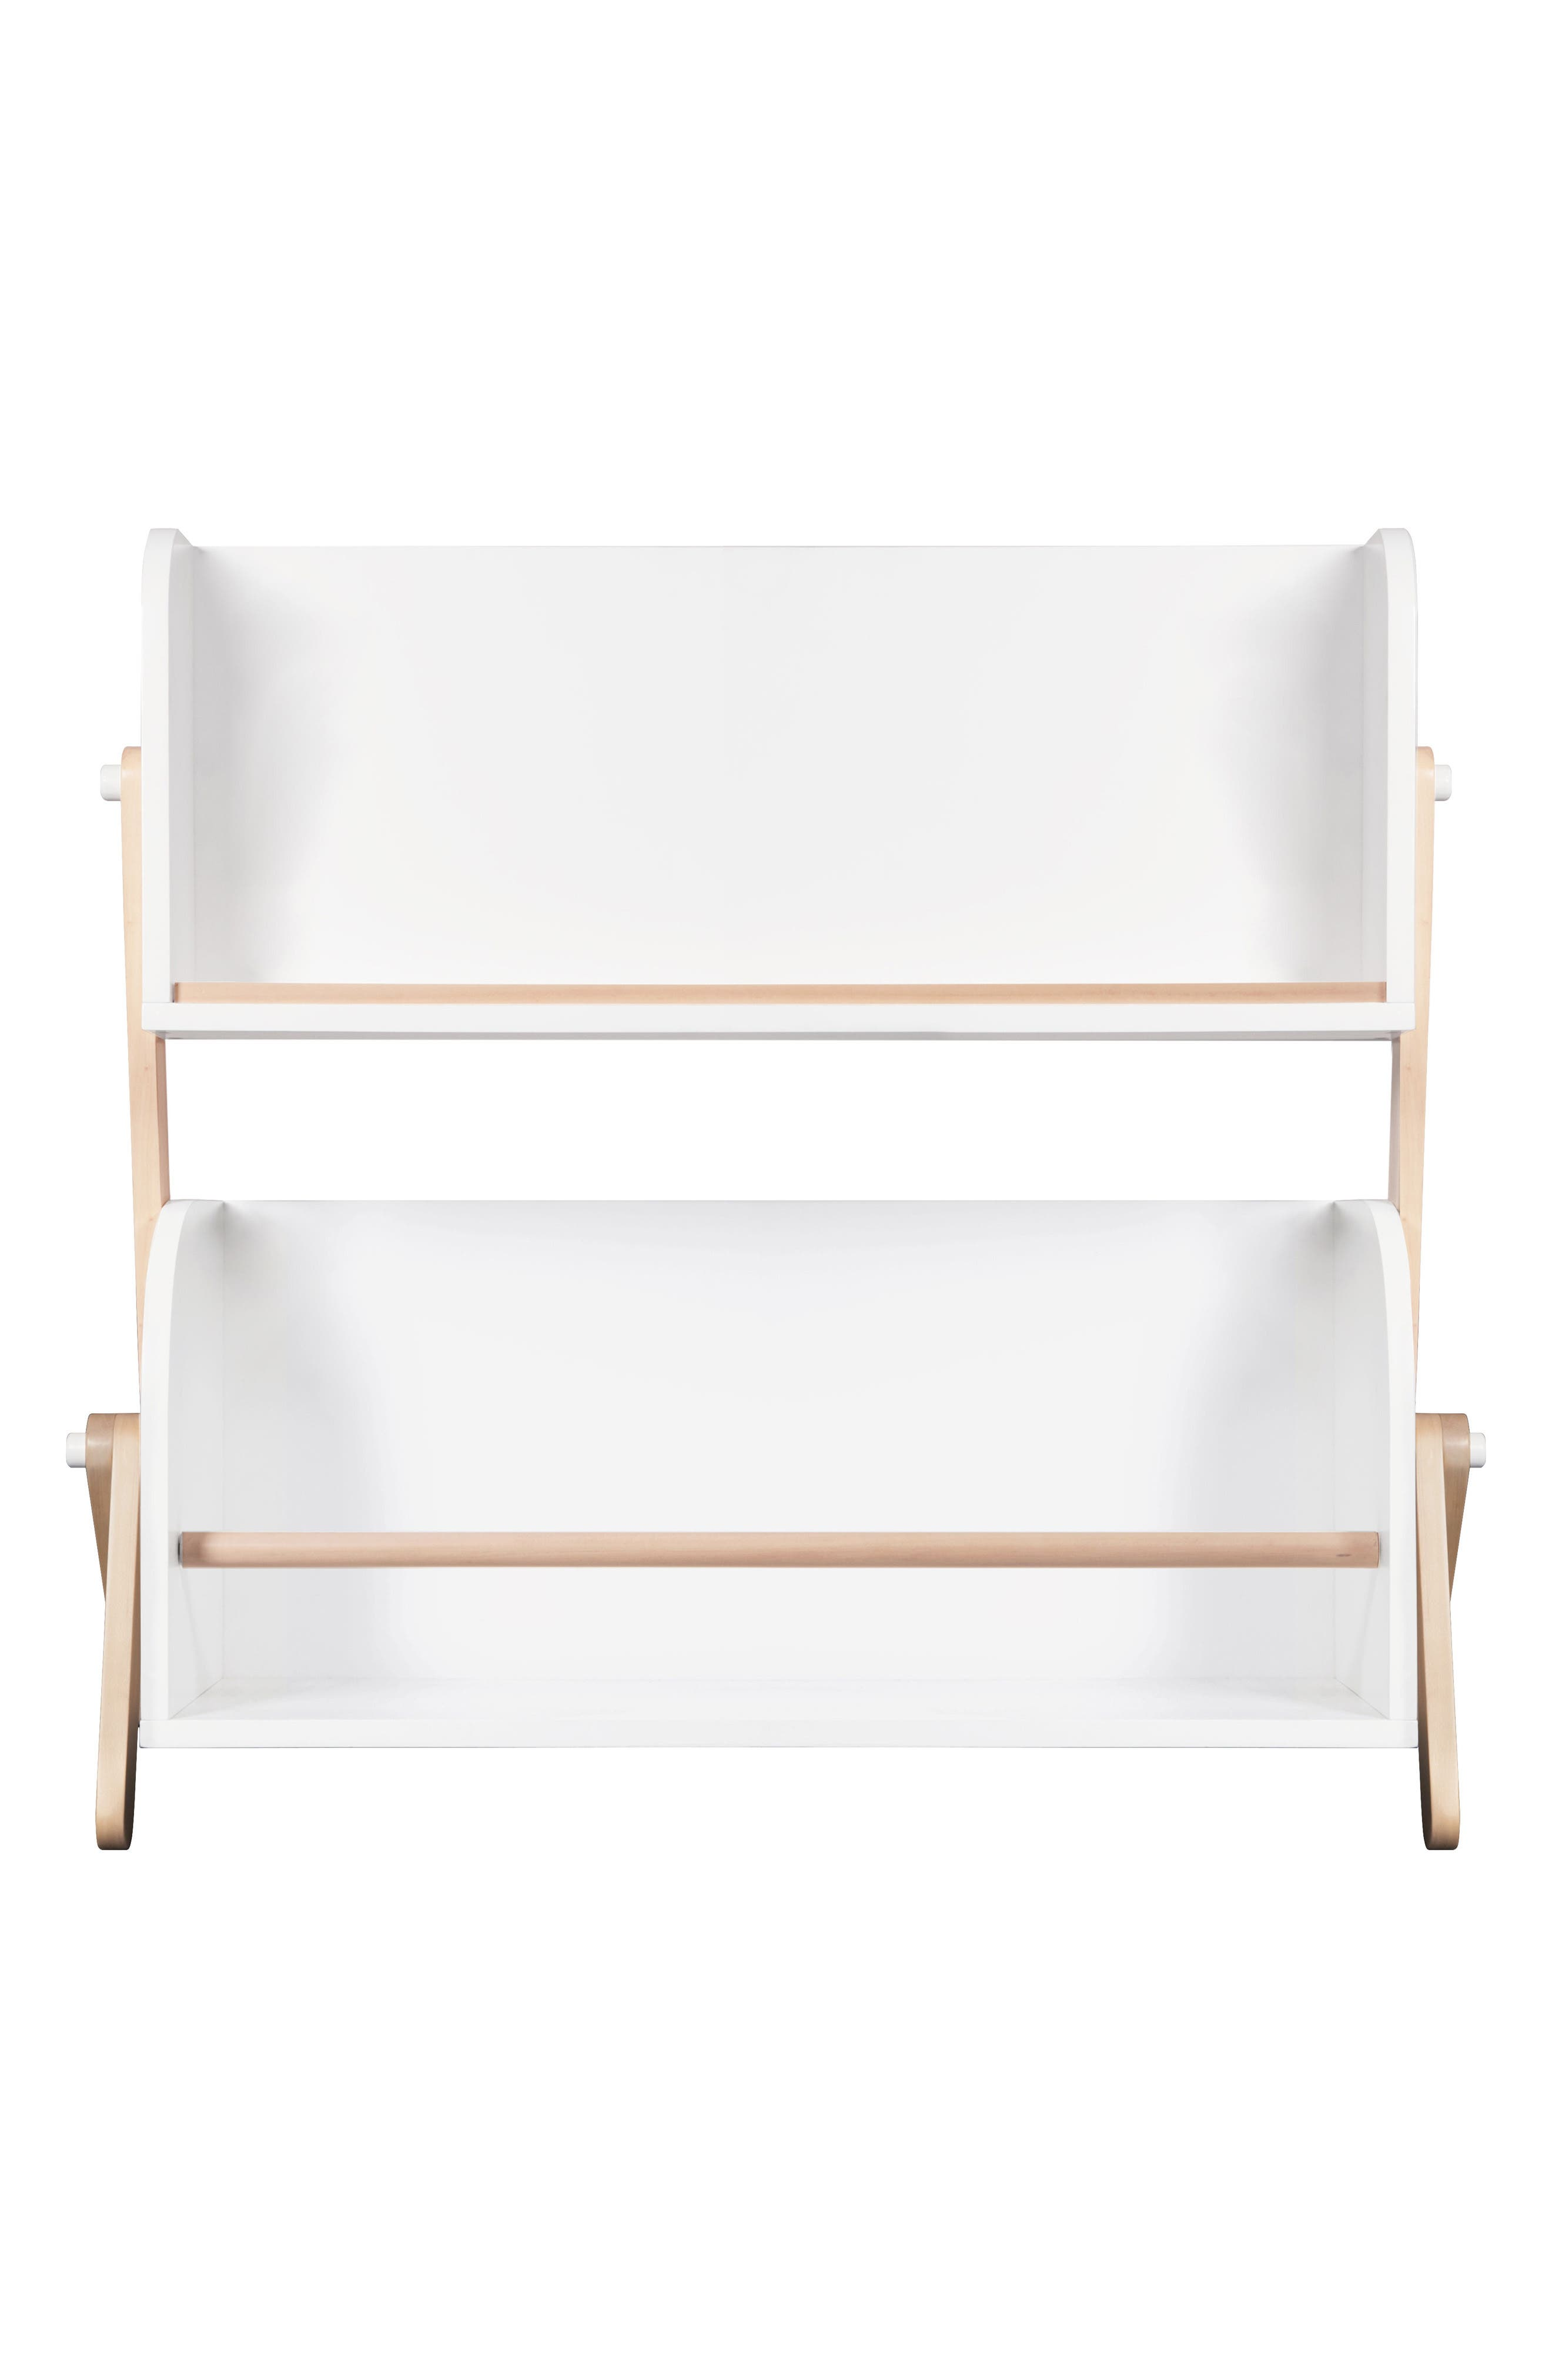 Tally Storage Bookshelf,                         Main,                         color, White/ Natural